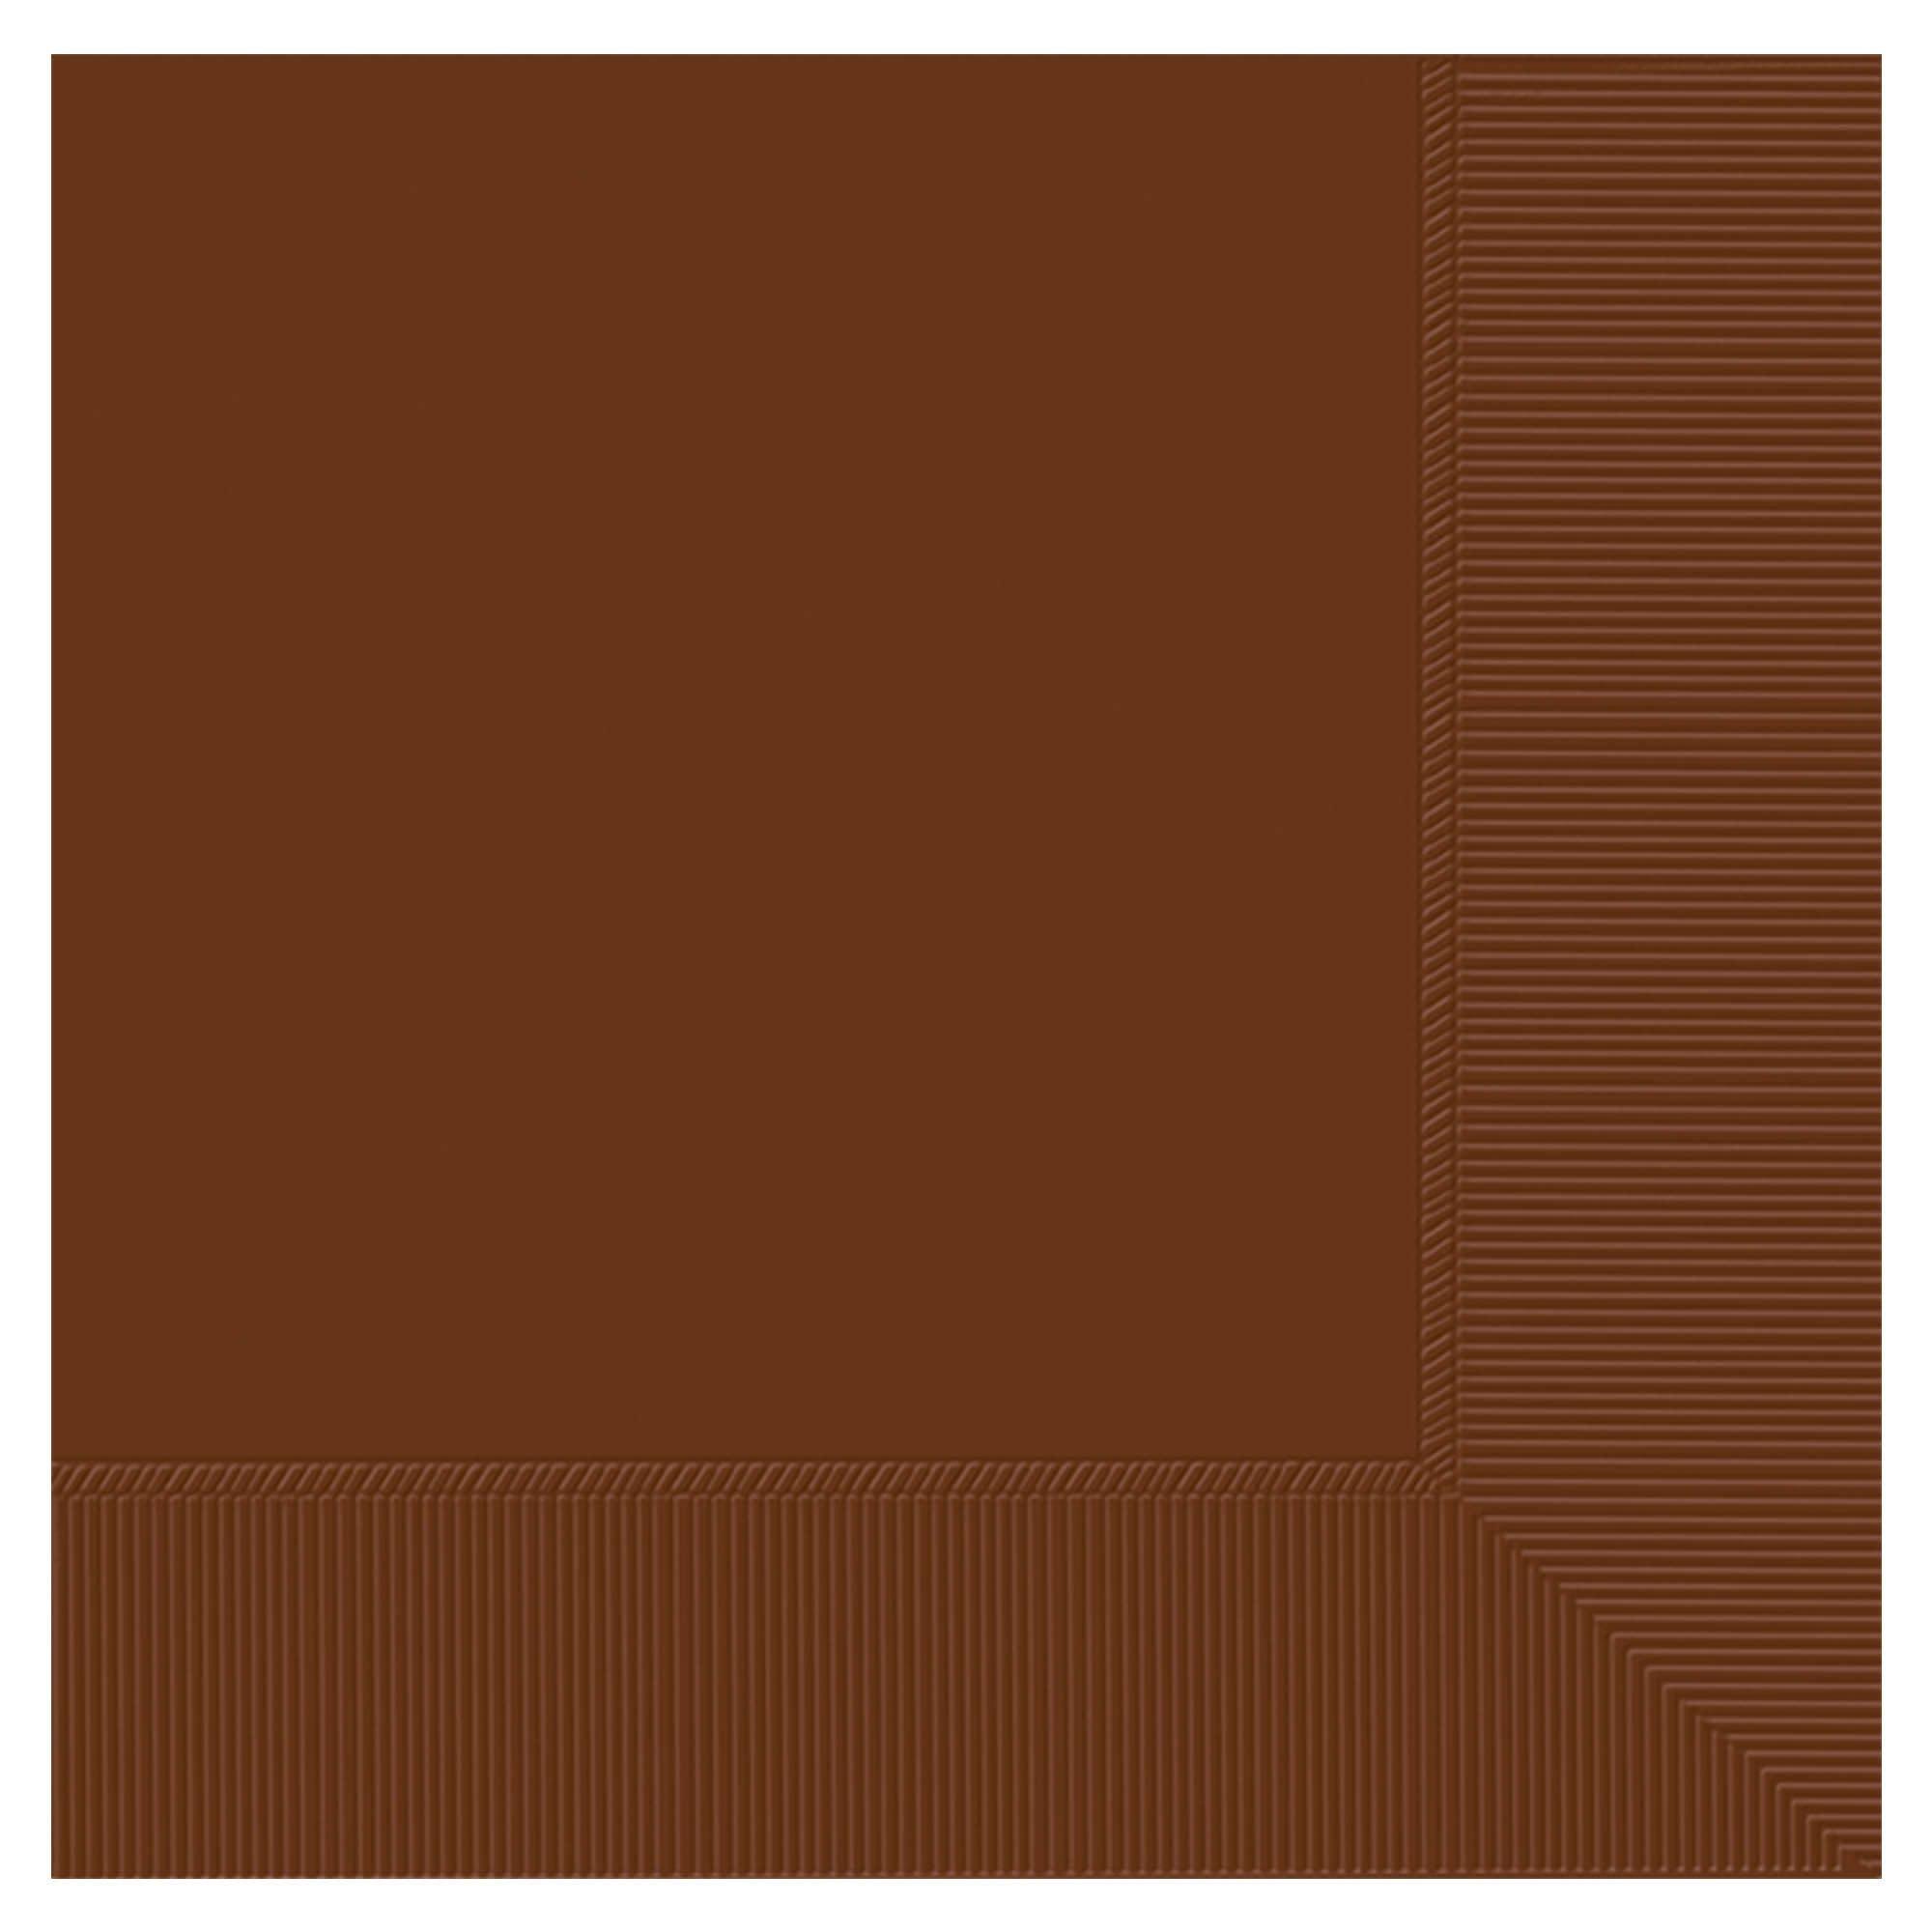 Chocolate Brown 3-Ply Beverage Napkins